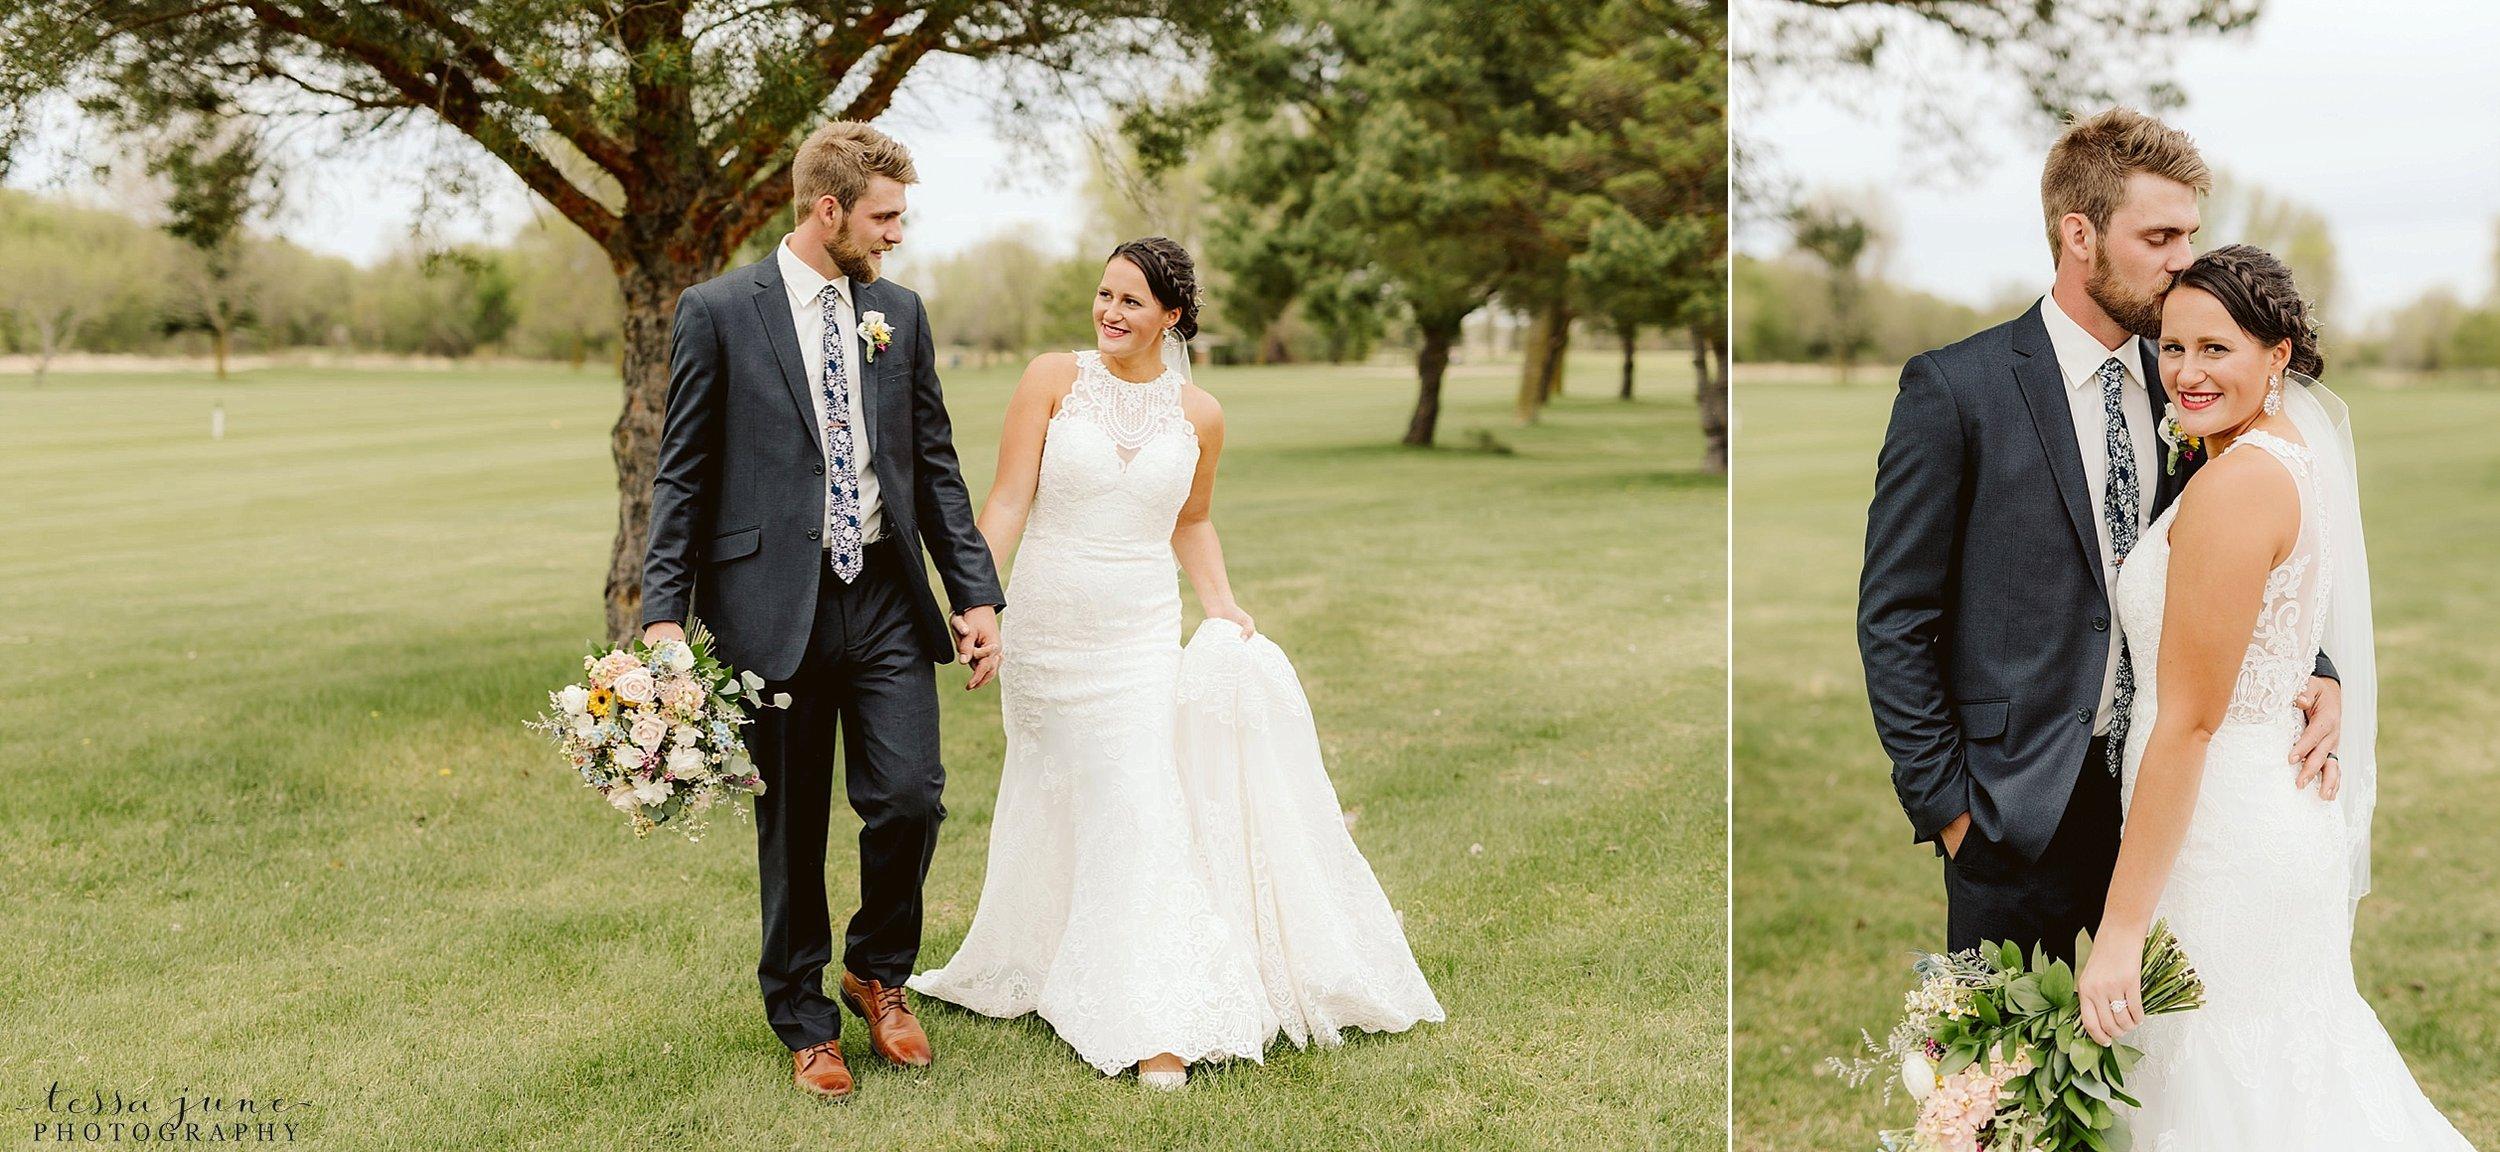 The-grands-at-mulligans-wedding-sartell-minnesota-spring-floral-spring-garden-wedding-57.jpg